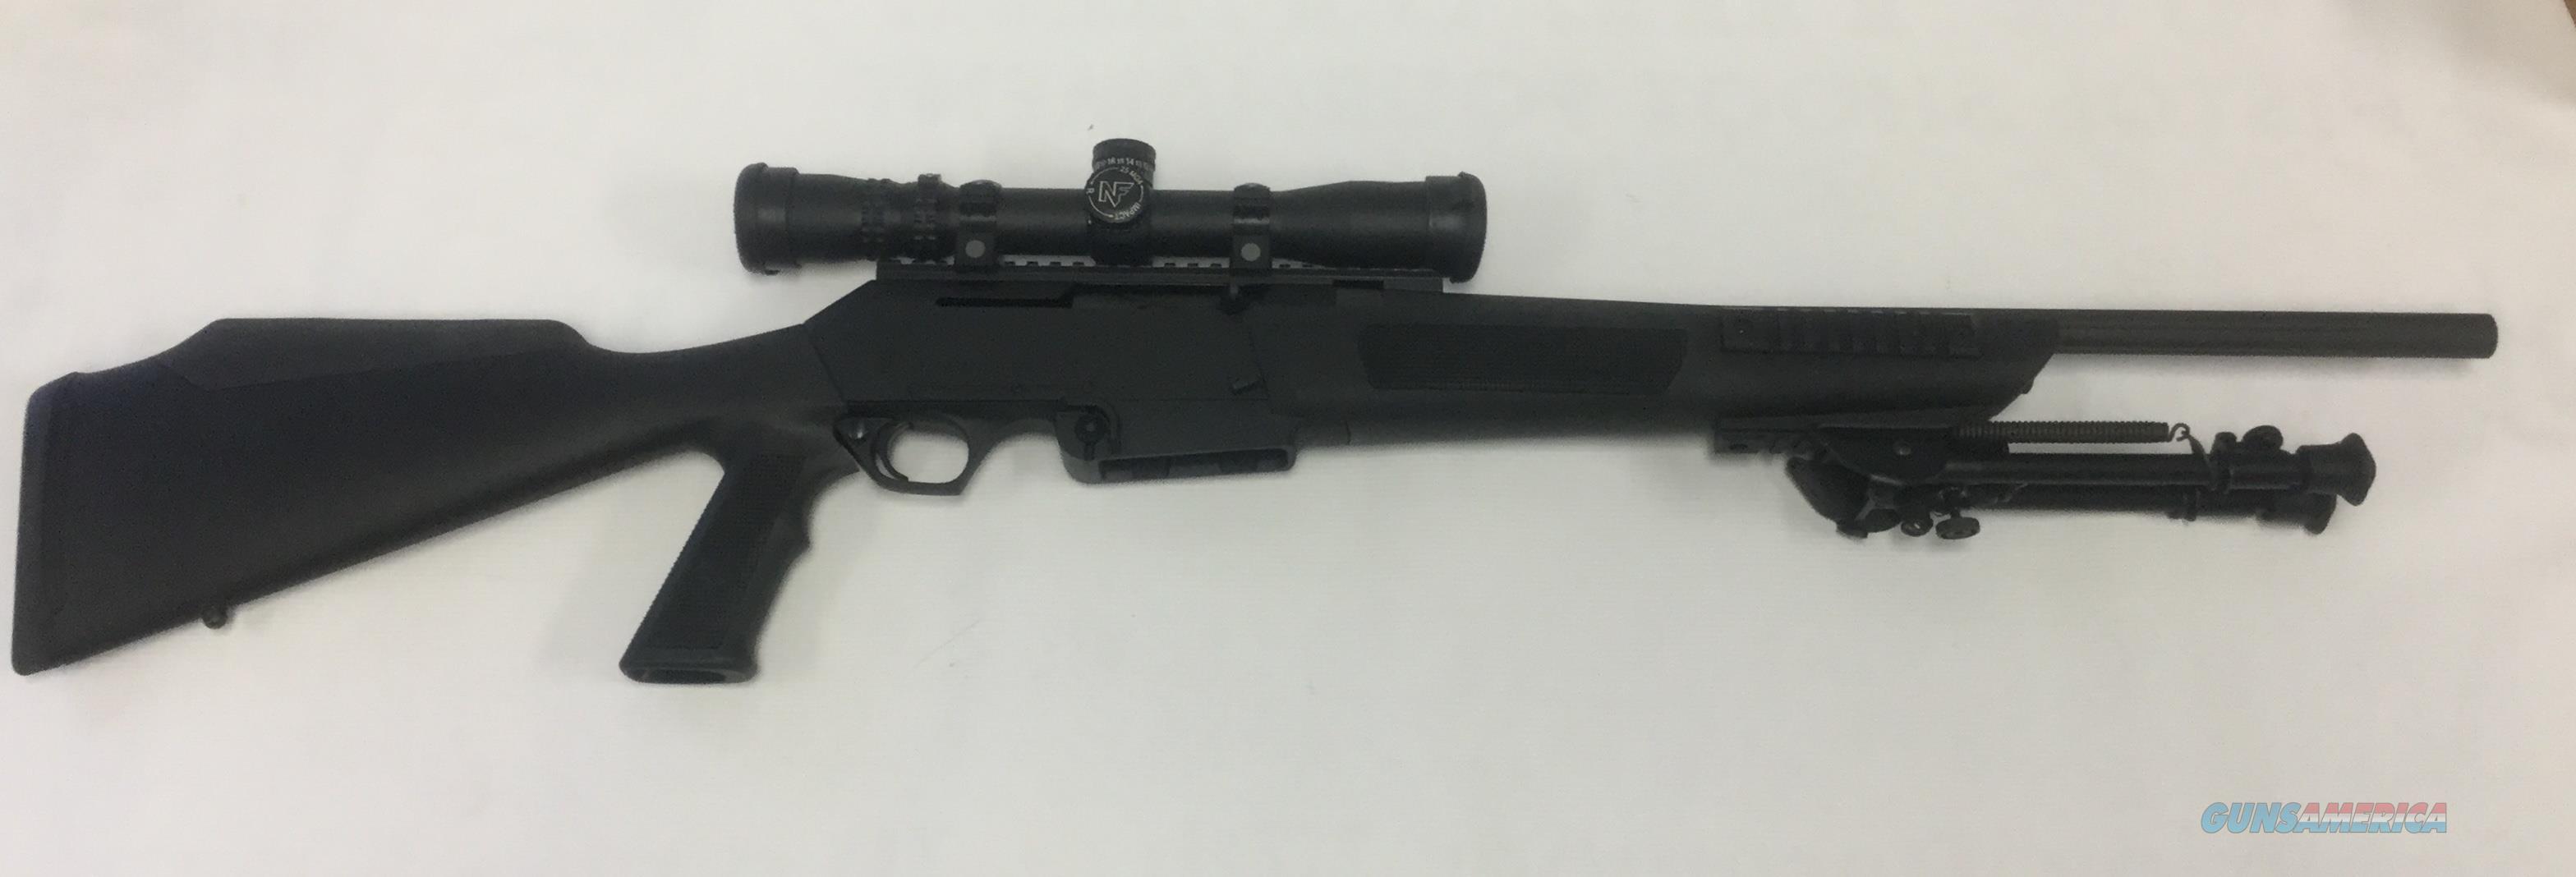 FNAR With NightForce Optic 7.62x51mm  Guns > Rifles > FNH - Fabrique Nationale (FN) Rifles > Semi-auto > FNAR